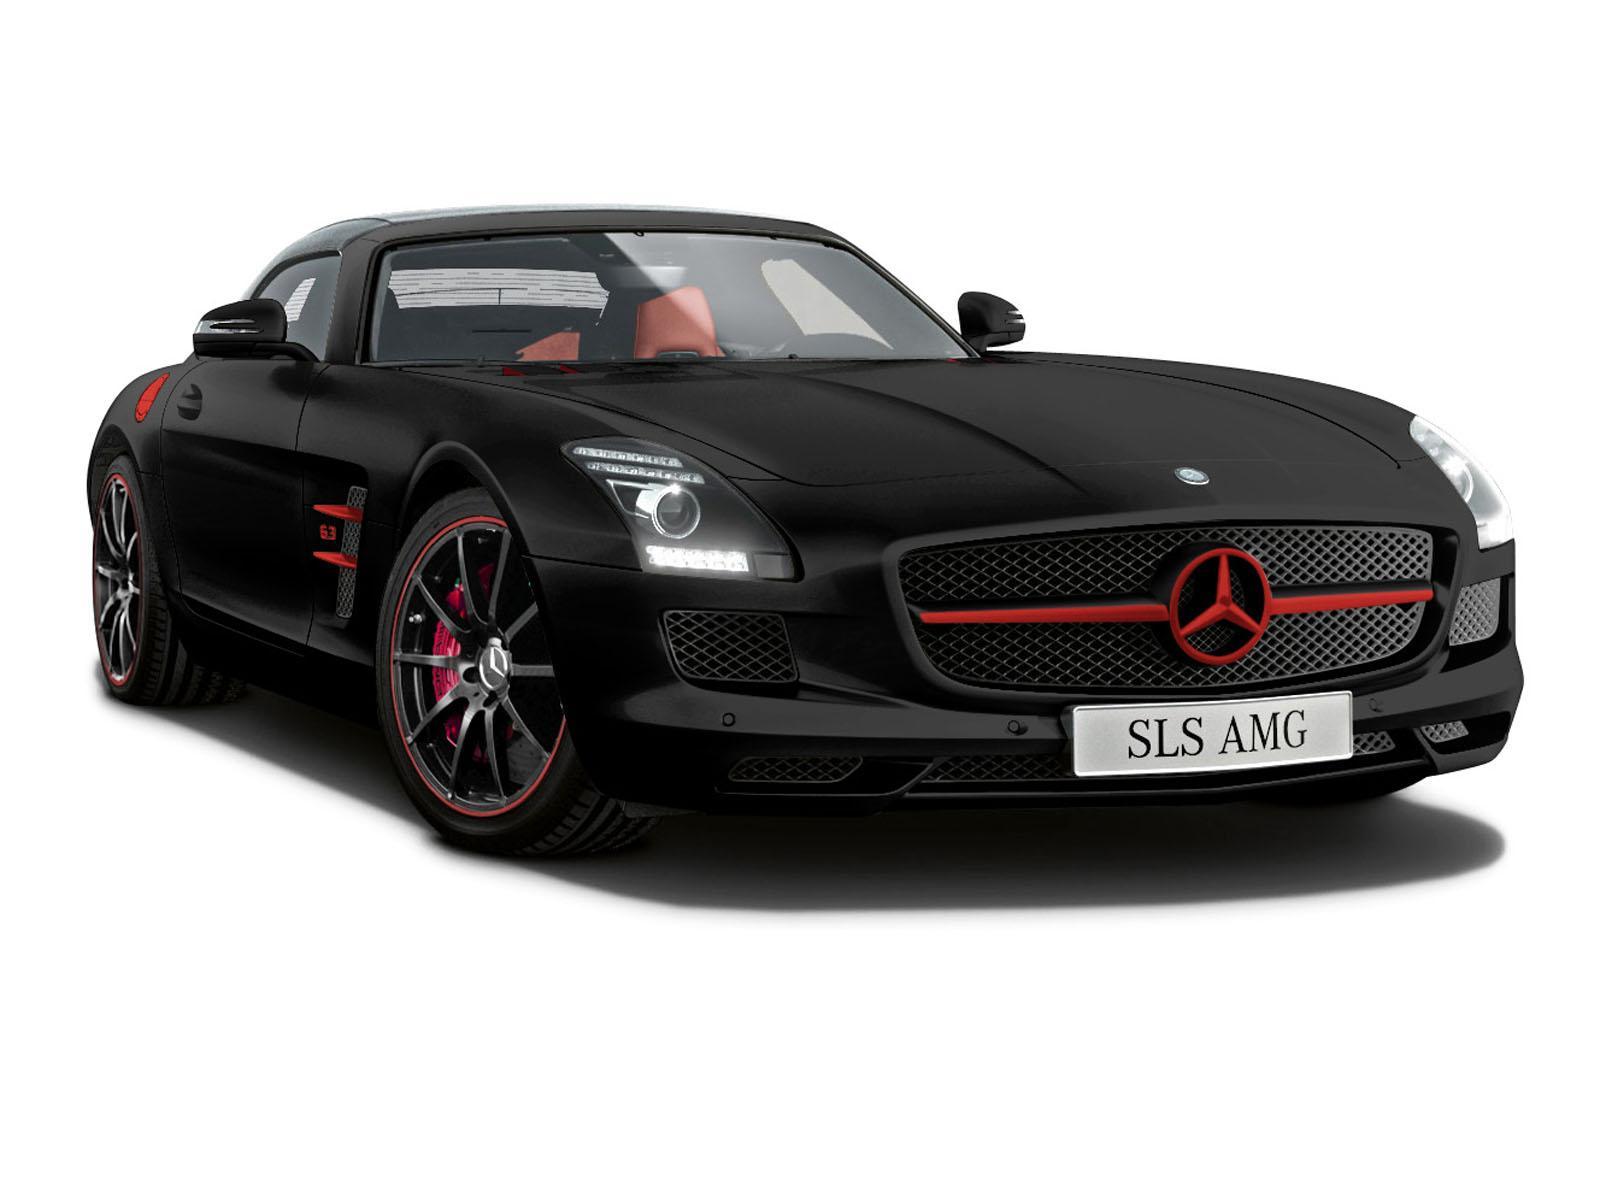 Mercedes sls amg matte editions for japan autoevolution